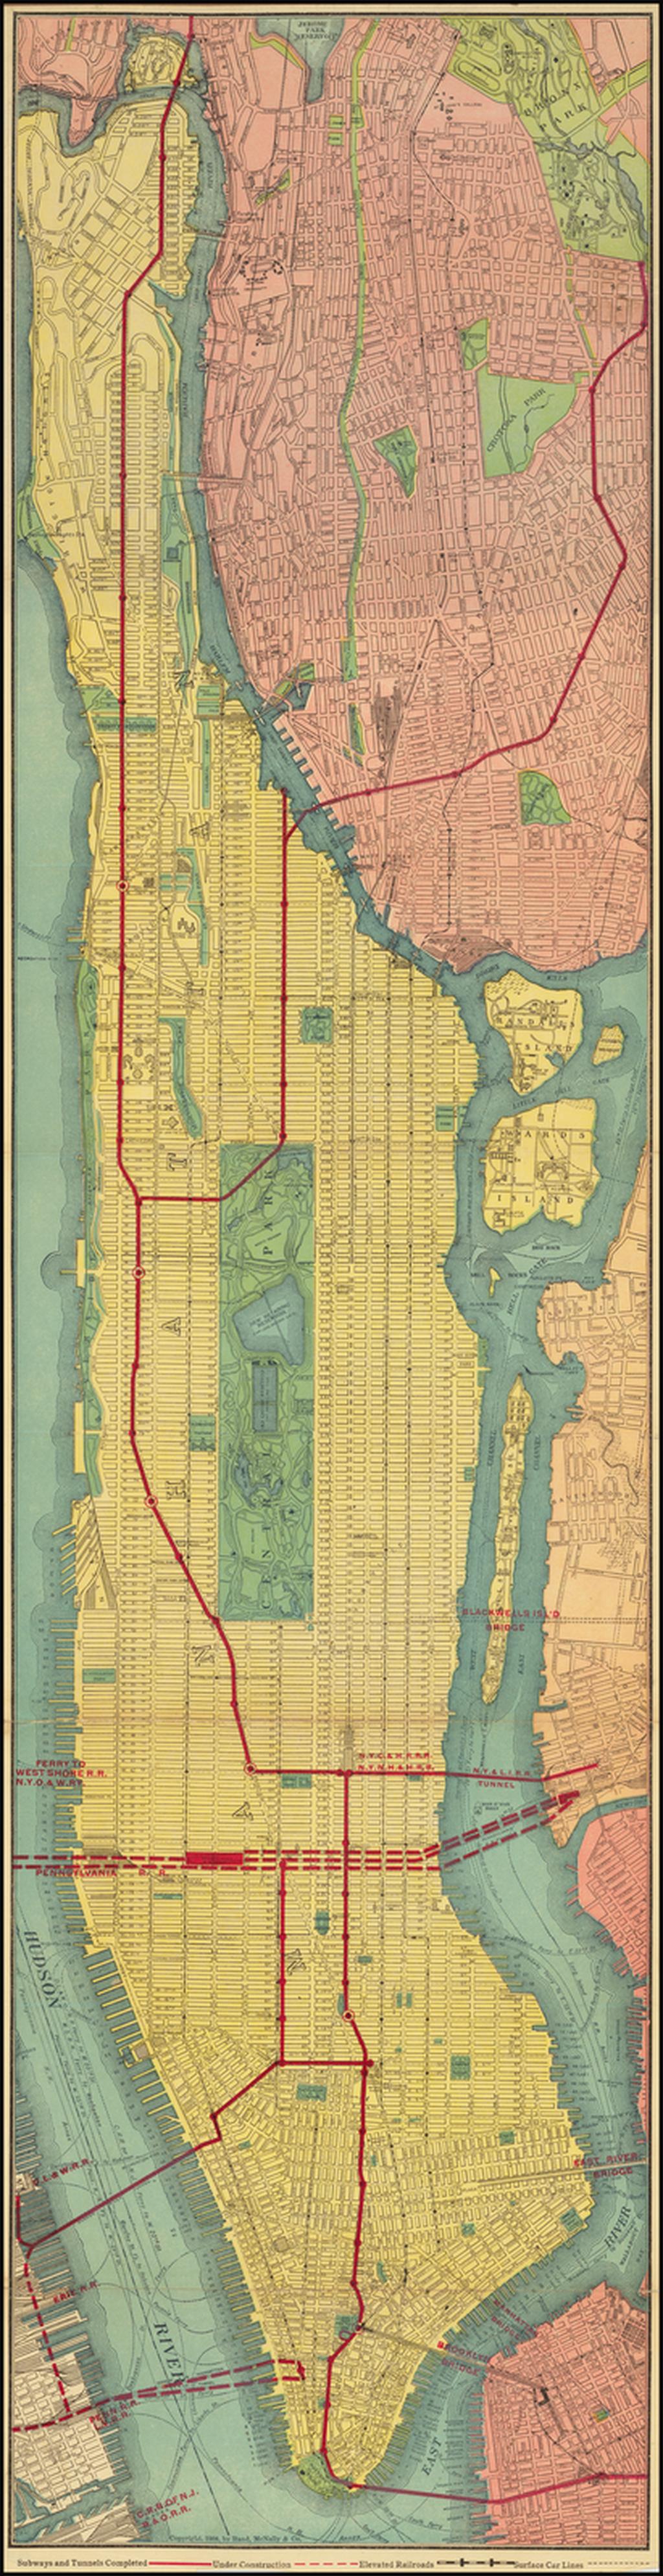 Rand McNally Map of the Borough of Manhattan By Rand McNally & Company